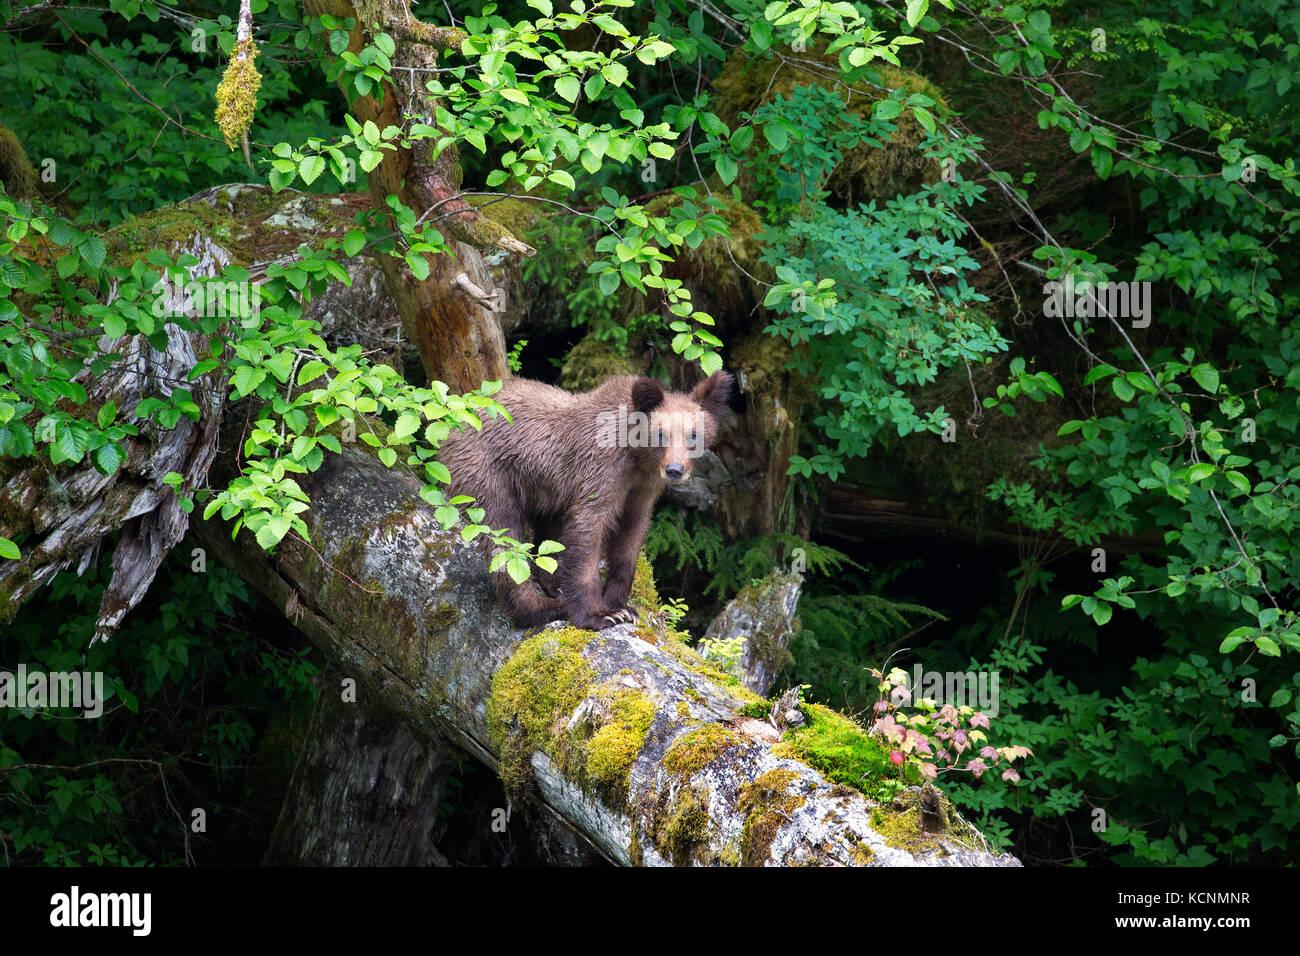 Grizzly bear (Ursus arctos horriblis), yearling cub on log, Khutzeymateen Grizzly Bear Sanctuary, British Columbia, - Stock Image